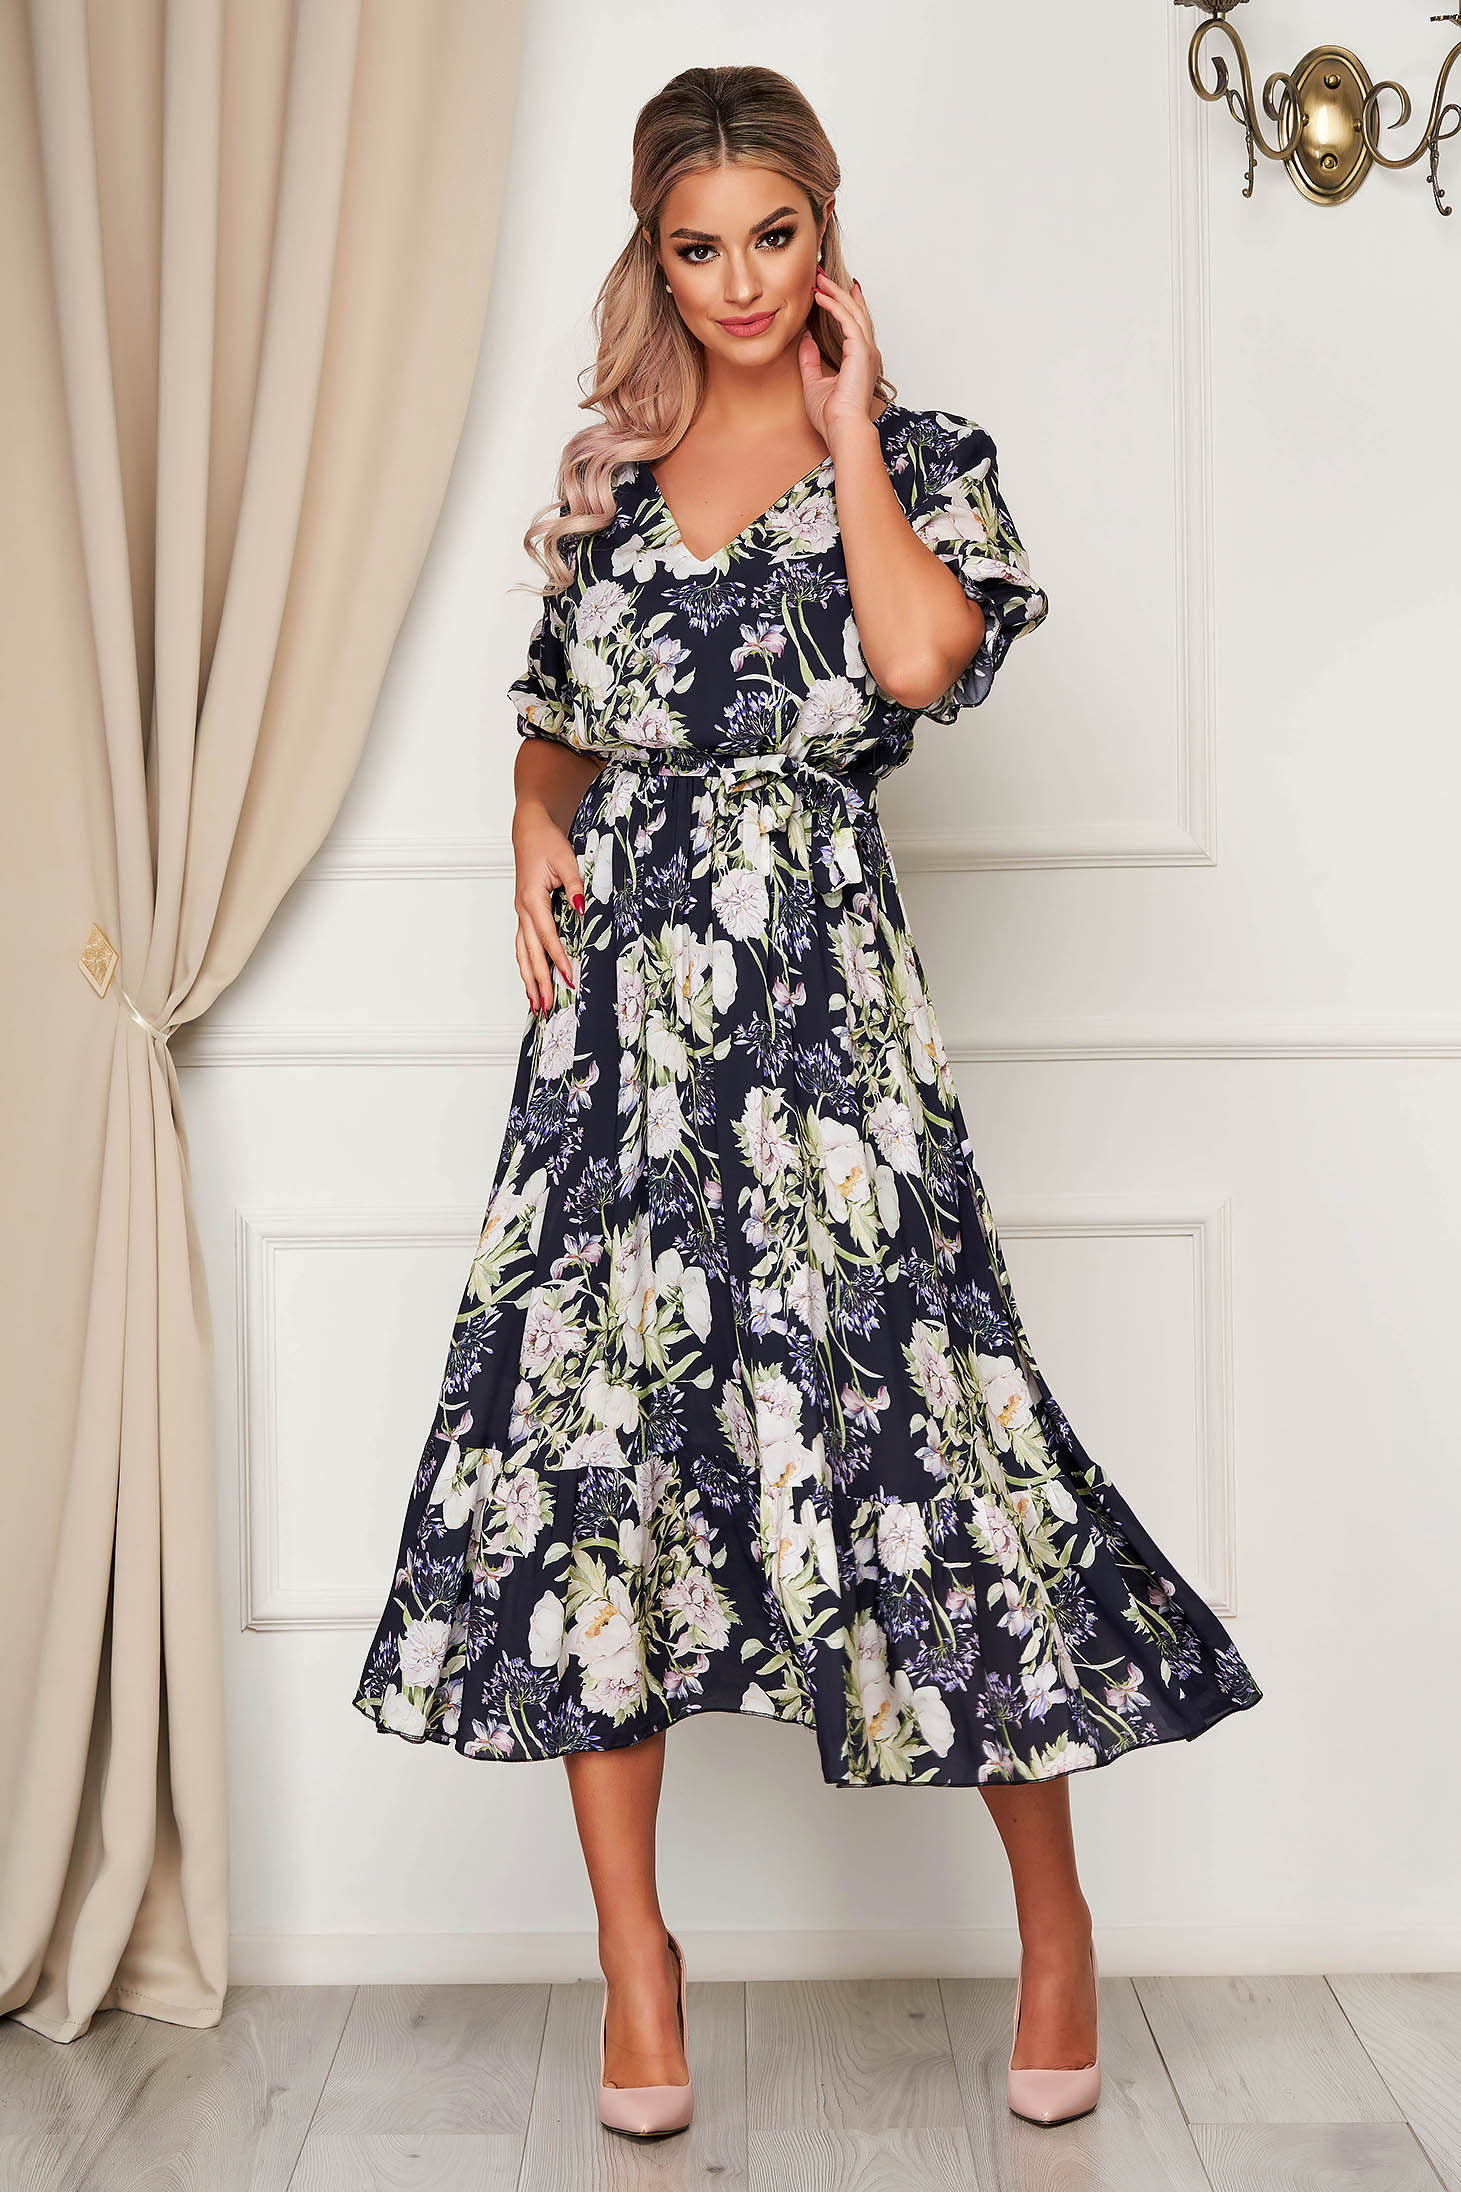 Rochie albastru-inchis de zi midi clos cu elastic in talie accesorizata cu cordon cu volanase la baza rochiei